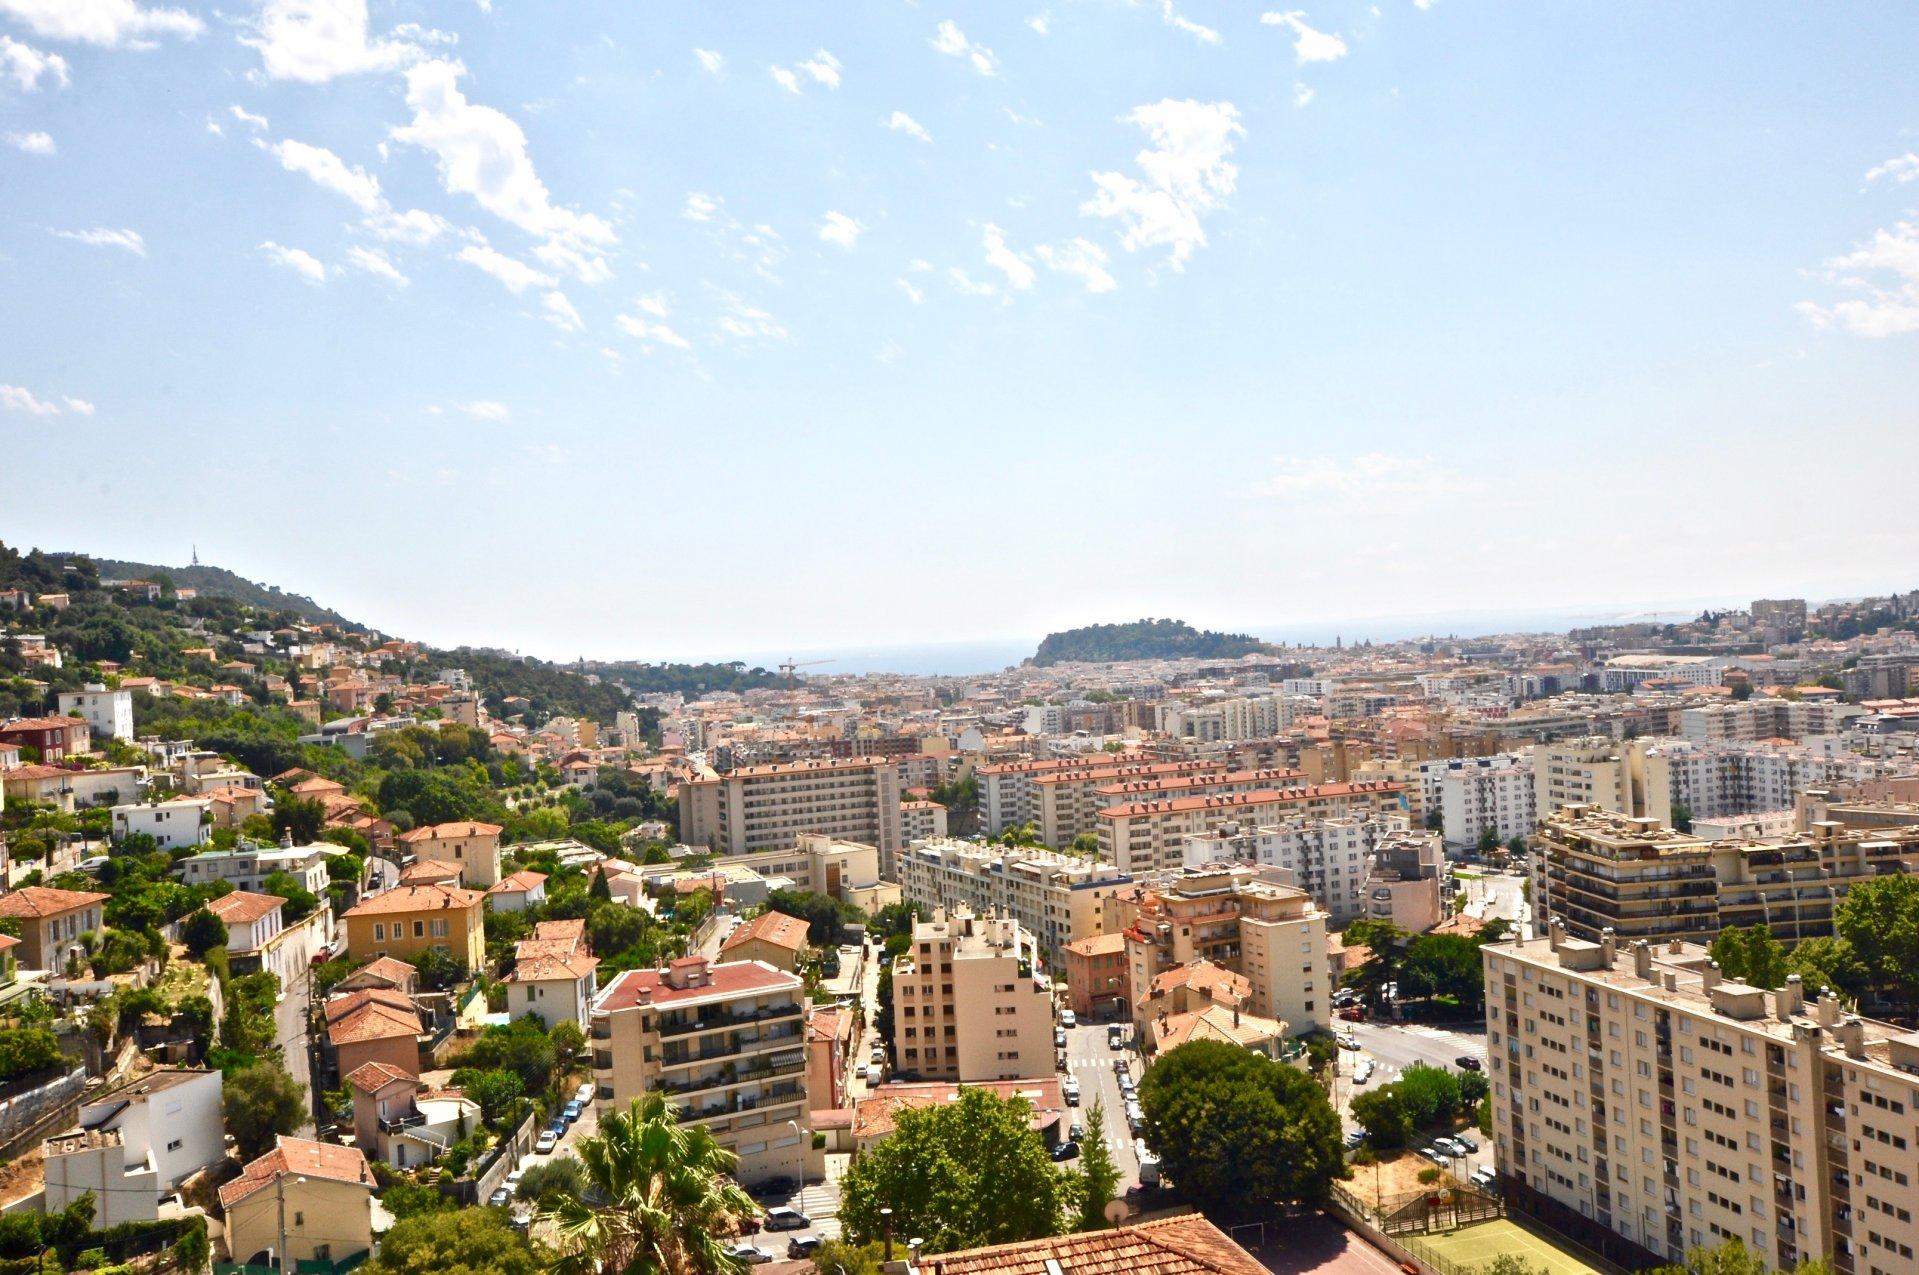 Verkauf Wohnung - Nizza (Nice) Grande Corniche